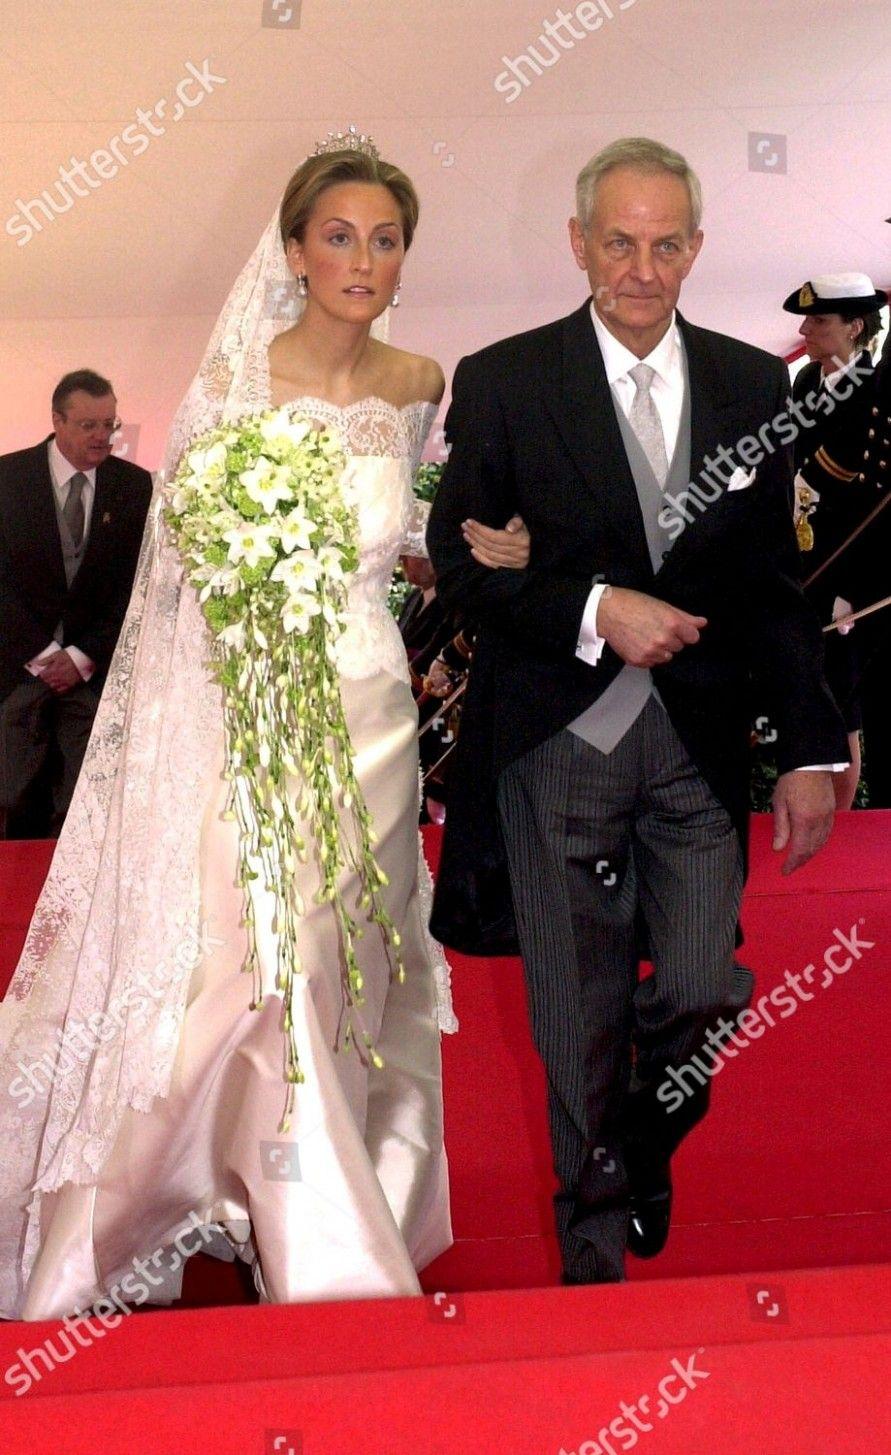 Princess Claire Of Belgium Wedding Dress [ 1455 x 891 Pixel ]